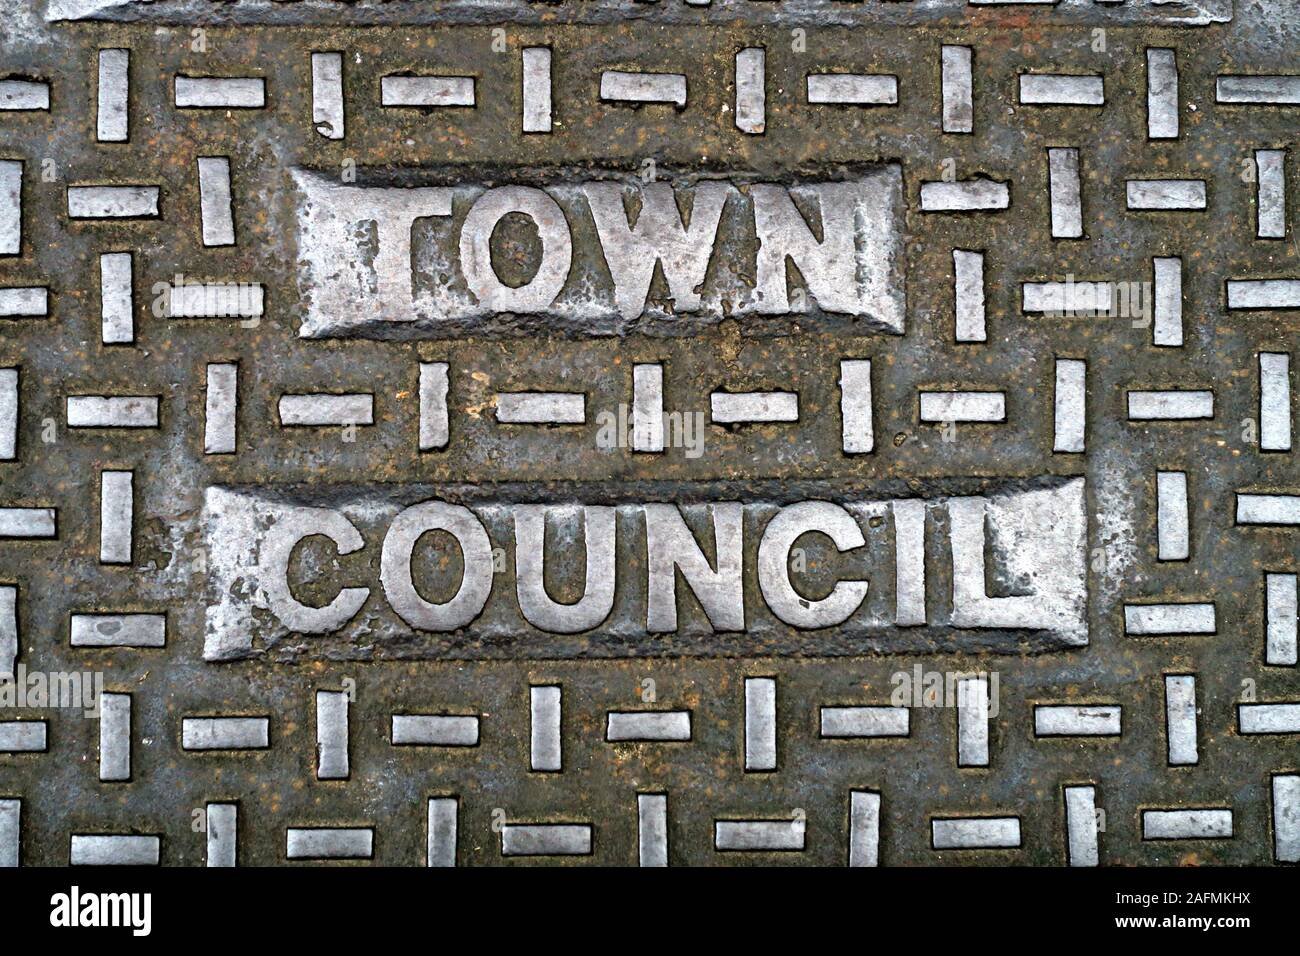 Dieses Stockfoto: Bridgwater Grid, Bridgwater Town, Somerset, South West of England, England, Großbritannien - Town Council - 2AFMKH